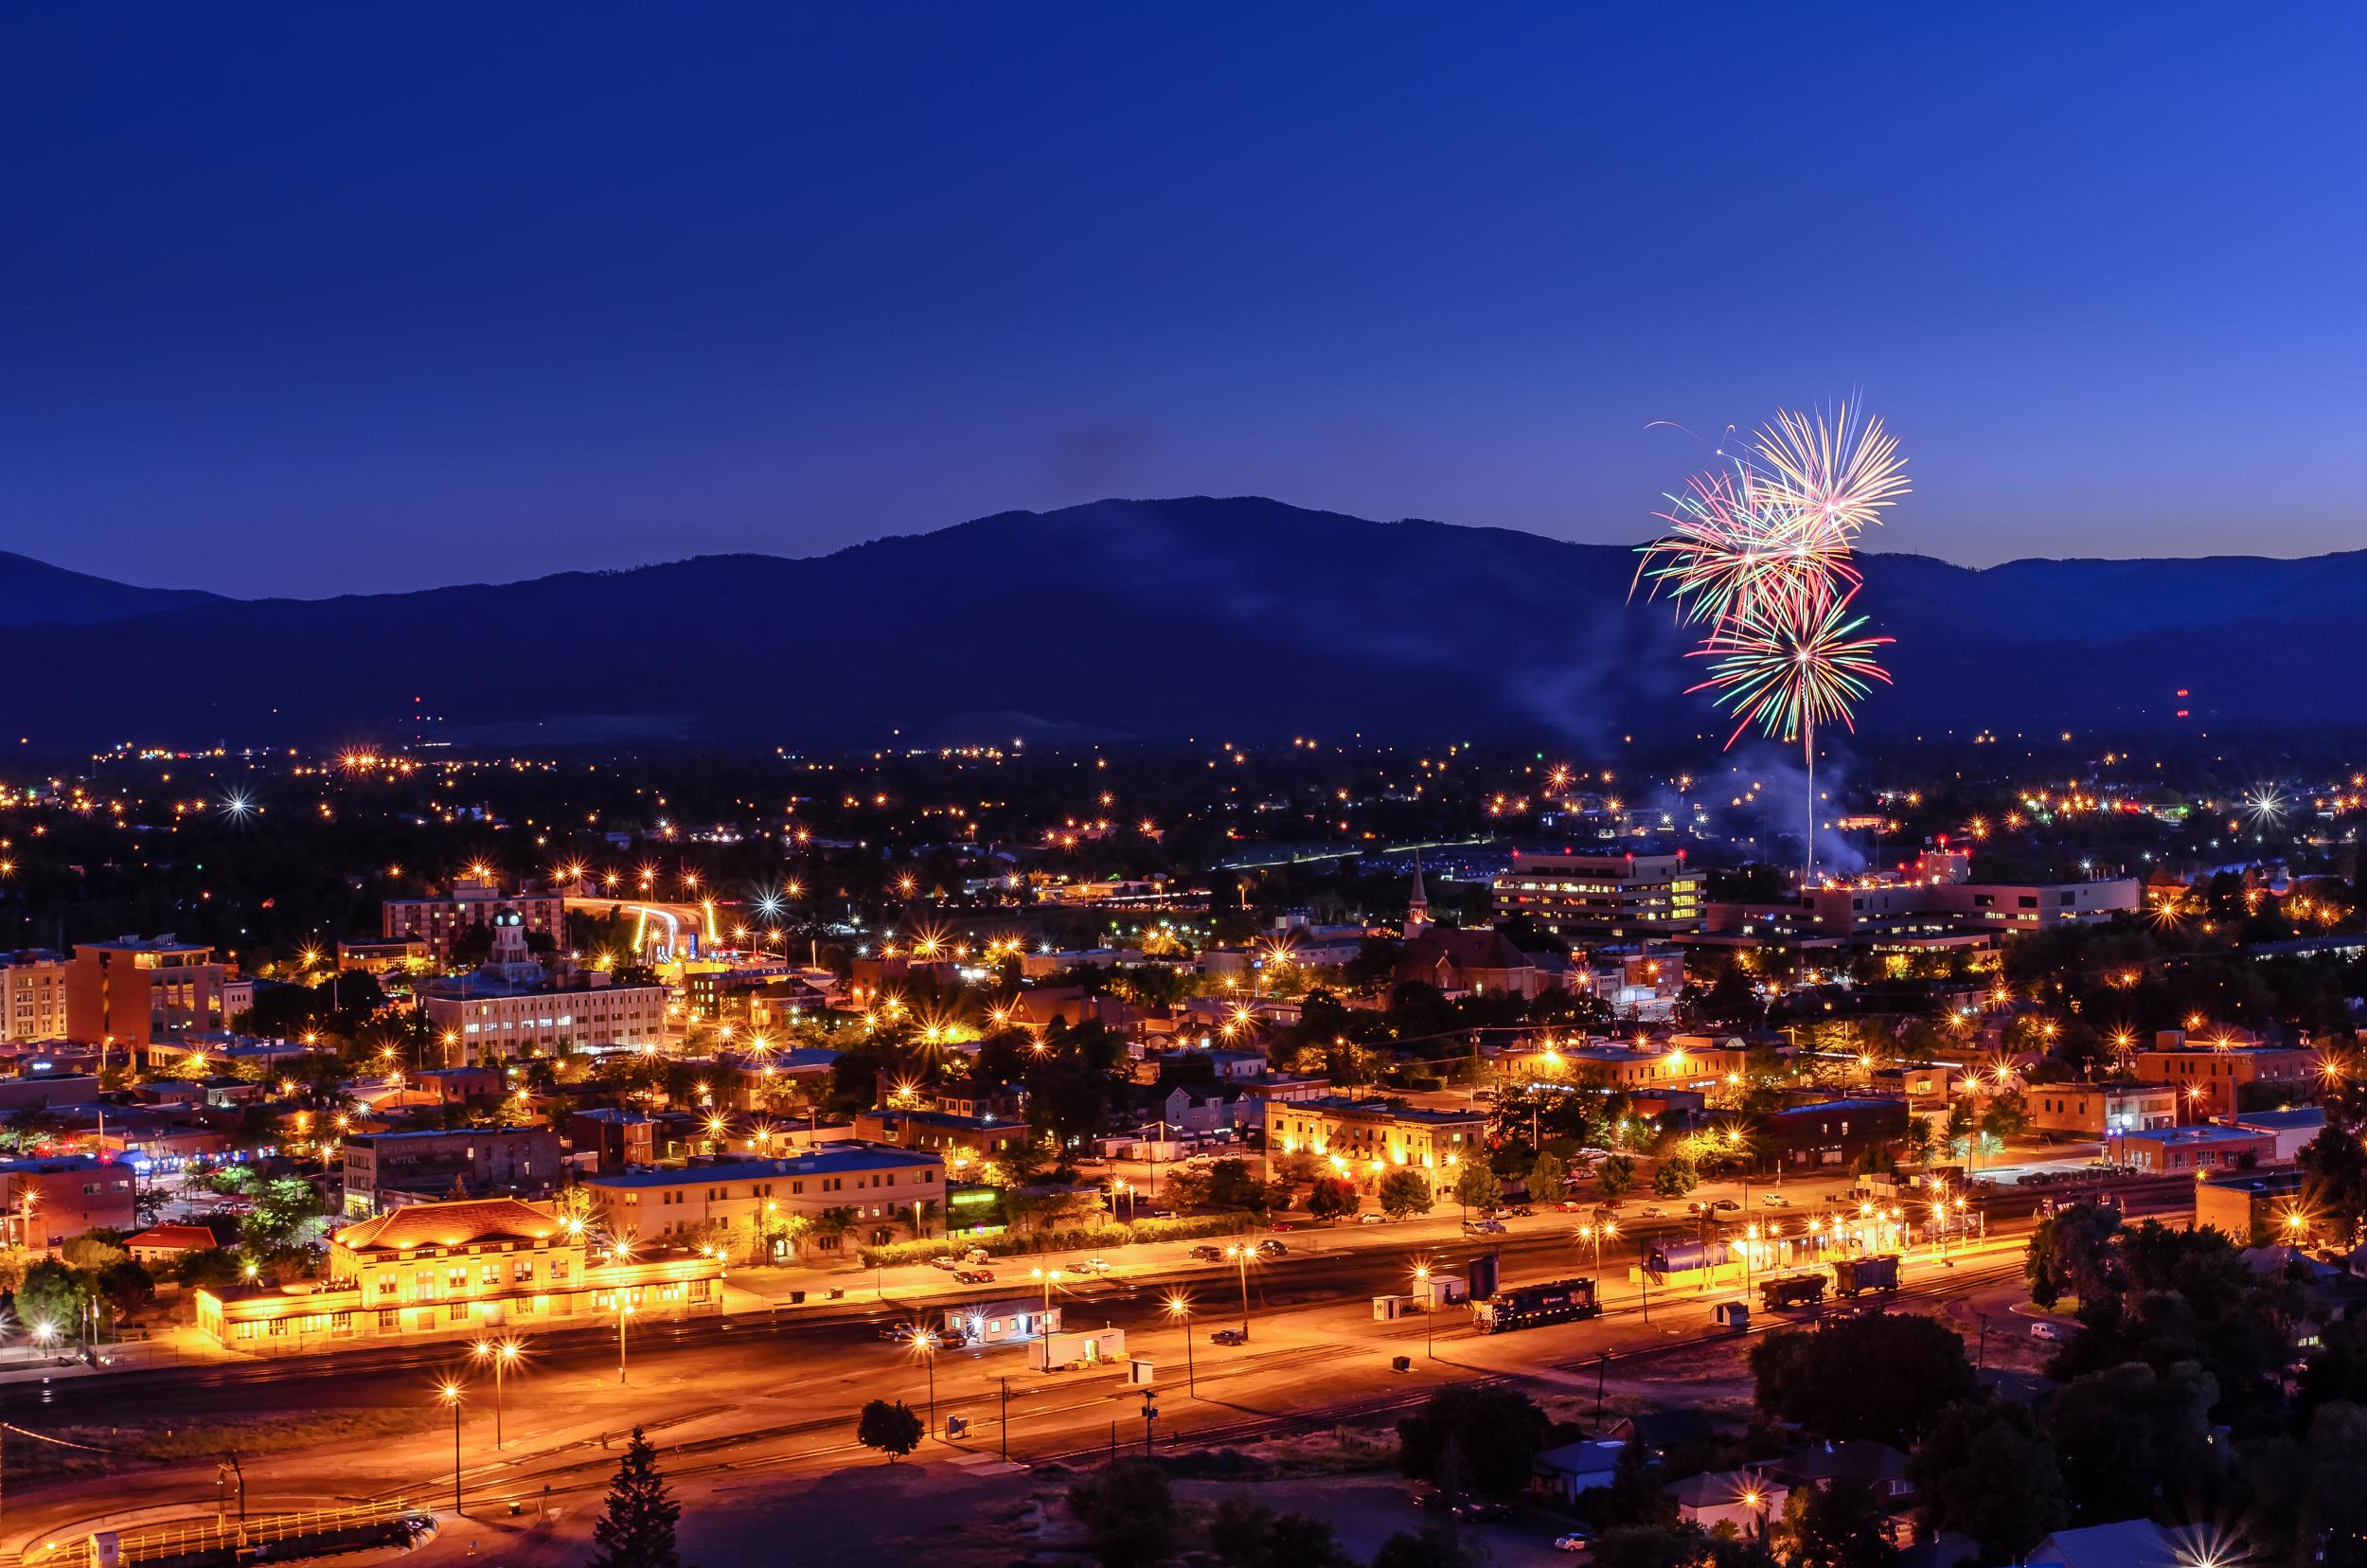 Downtown Missoula, Montana